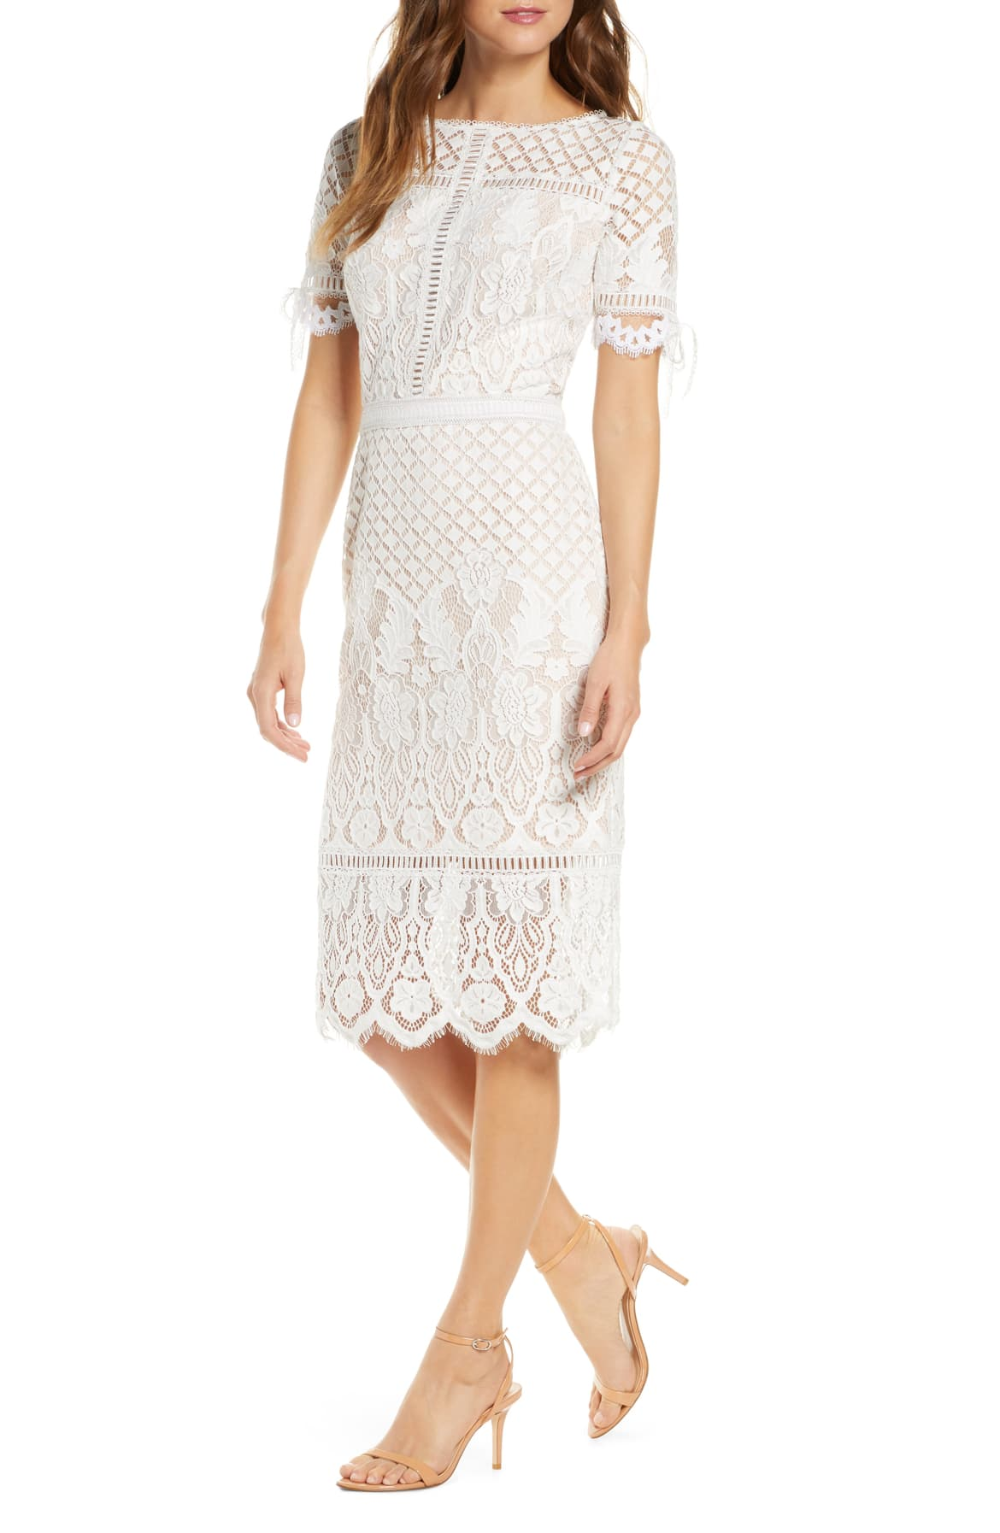 Tadashi Shoji Tie Sleeve Lace Sheath Dress In 2020 Nordstrom Dresses Dresses Prom Dresses With Sleeves [ 1533 x 1000 Pixel ]